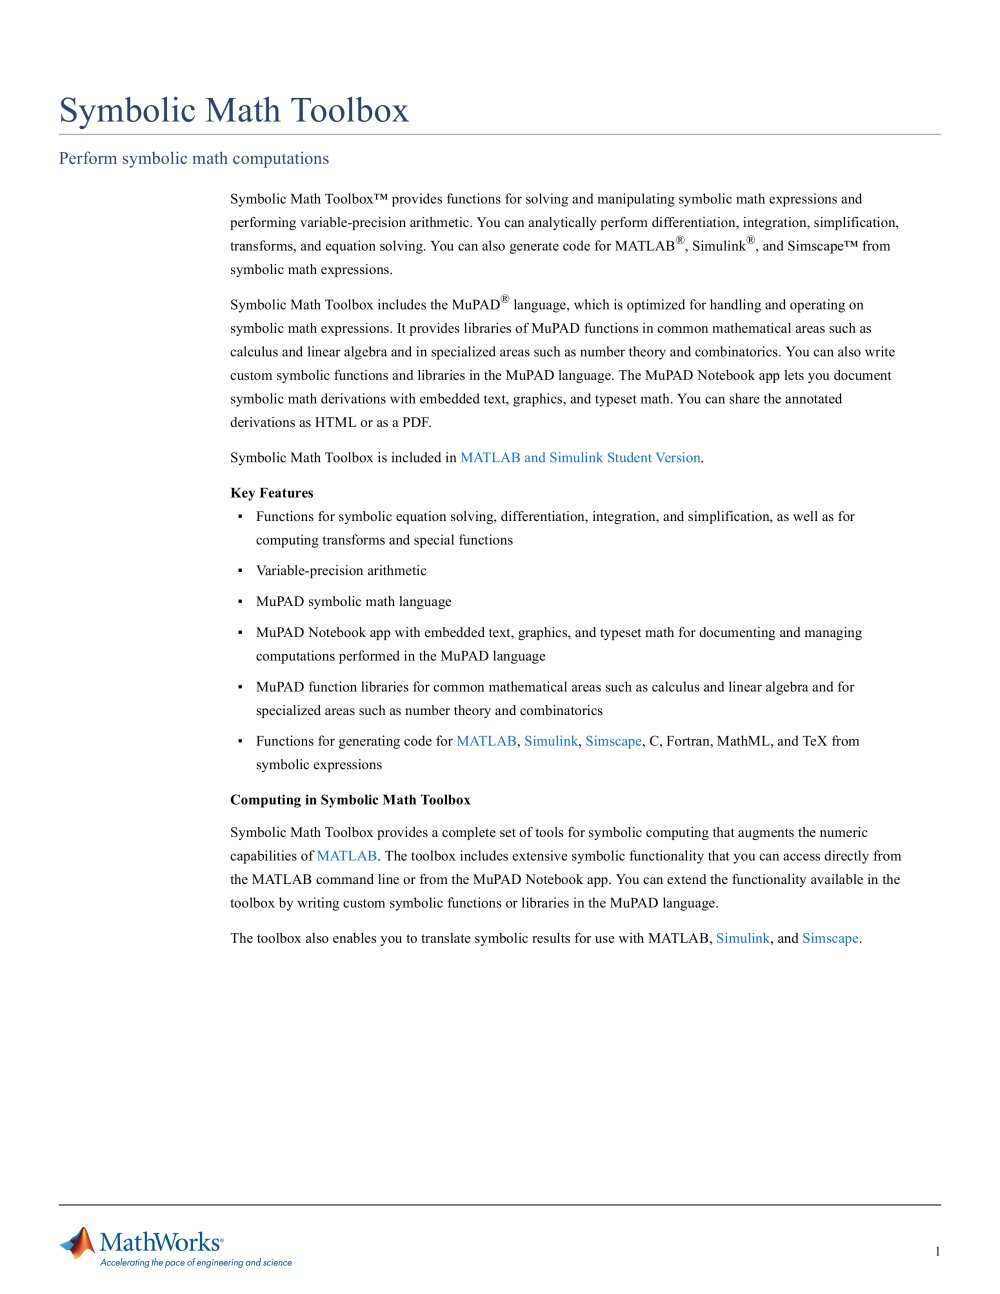 Symbolic Math Toolbox The Mathworks Pdf Catalogue Technical